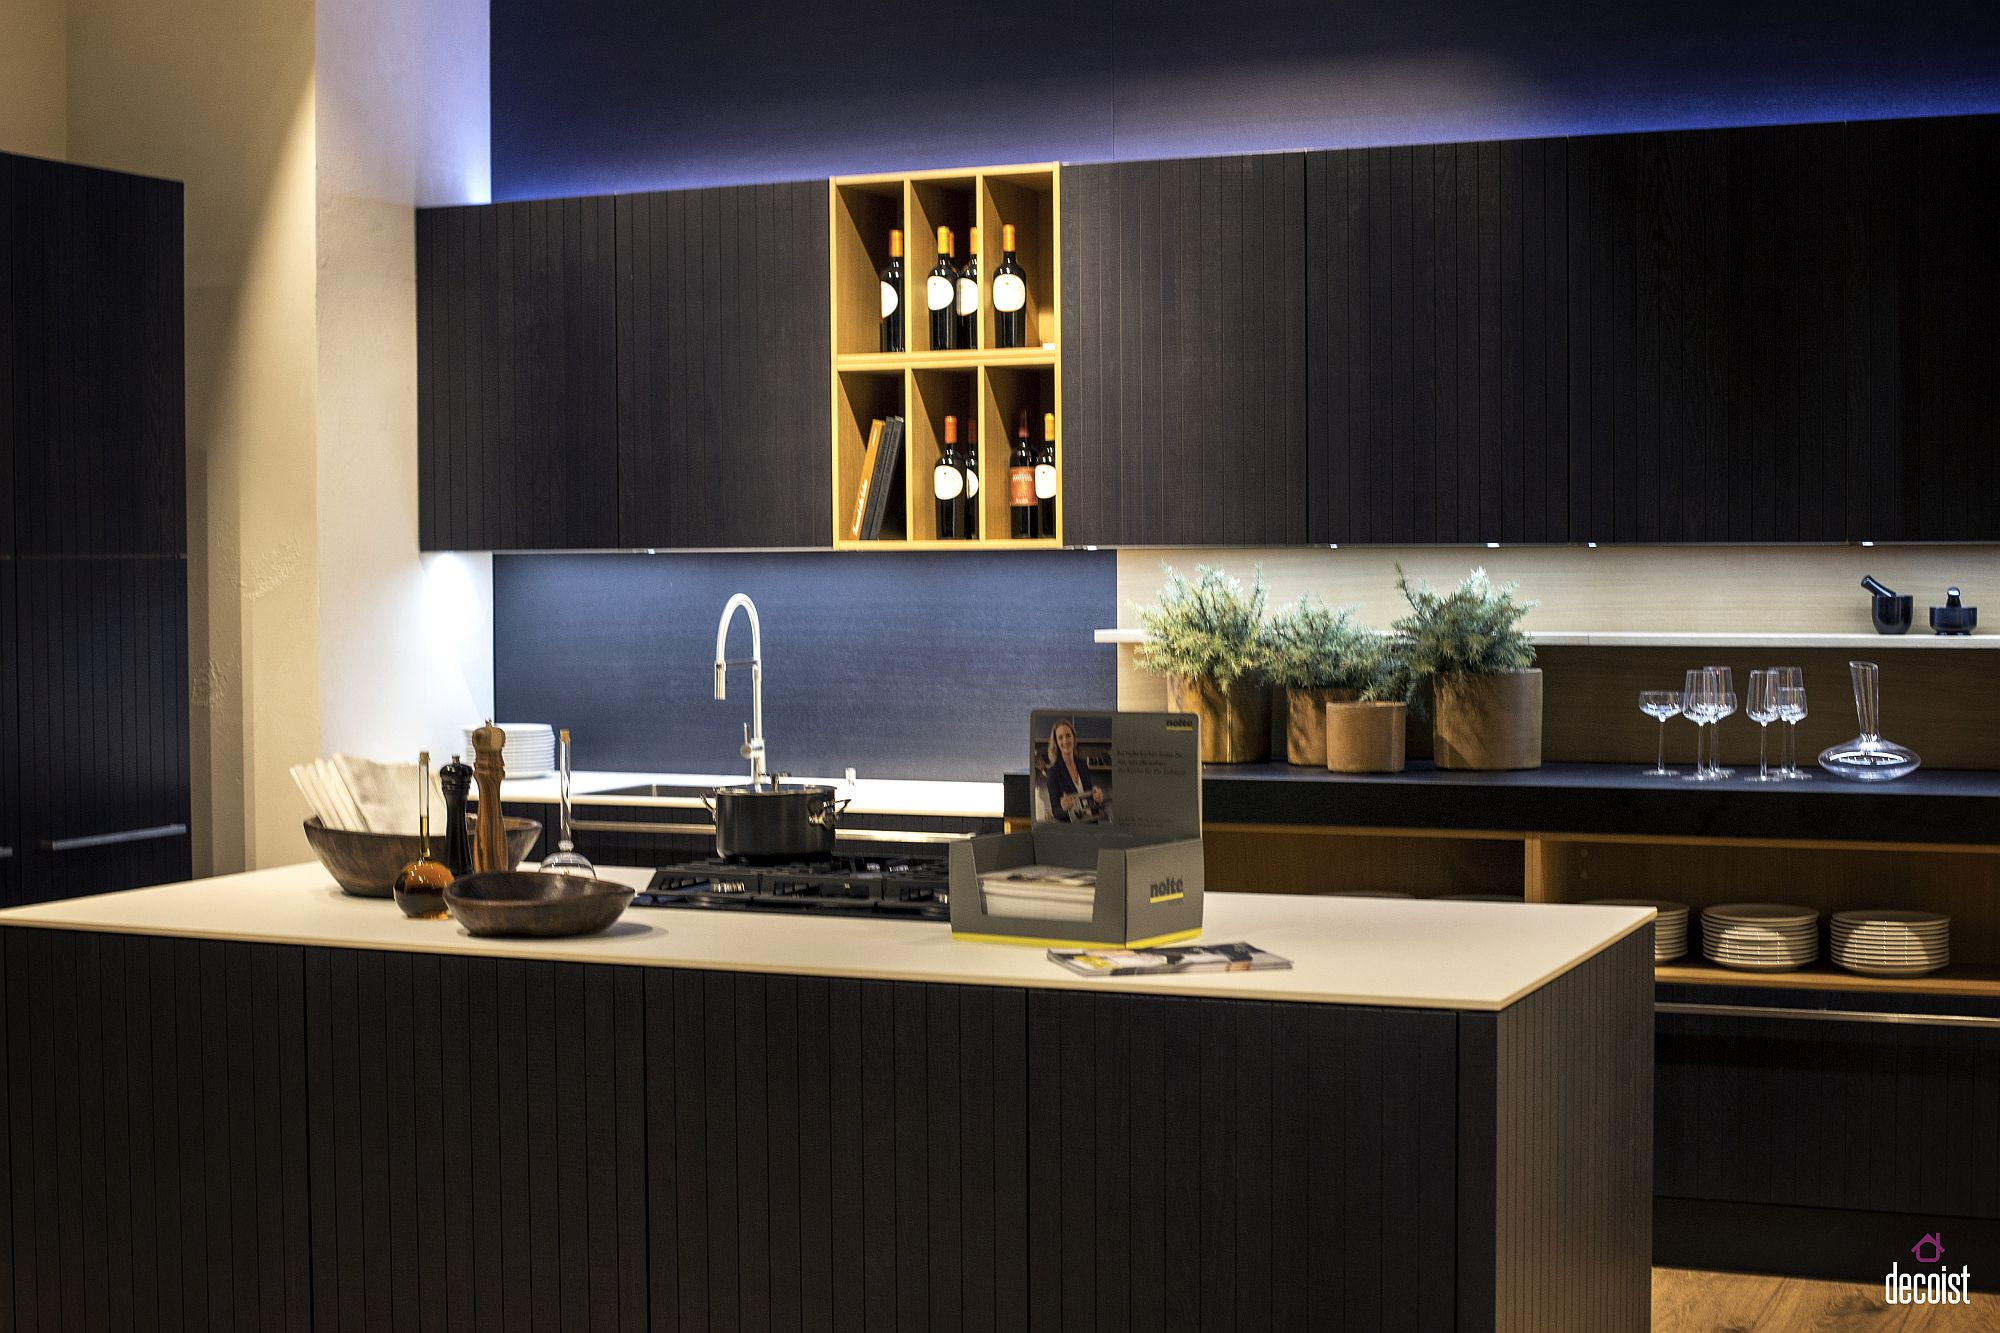 Lighting the dark kitchen right makes a big impact